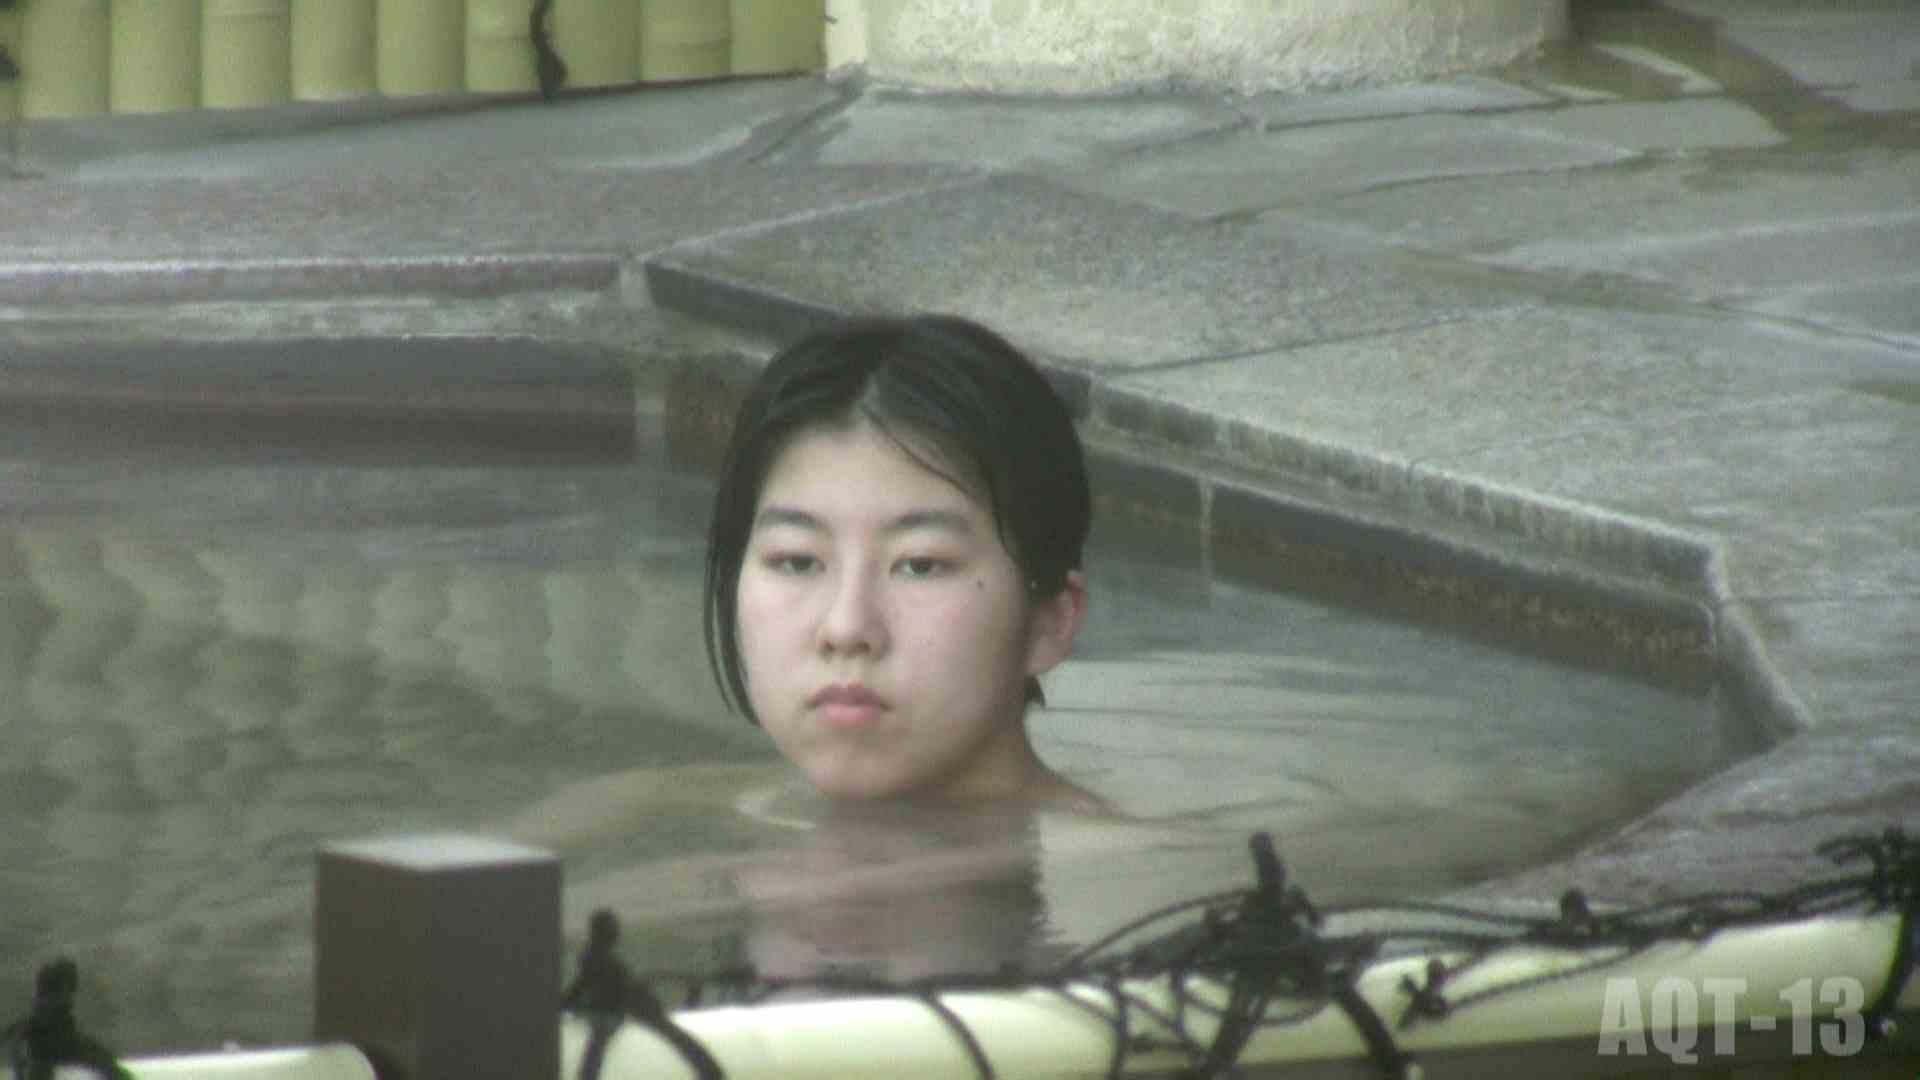 Aquaな露天風呂Vol.816 盗撮 オマンコ無修正動画無料 80画像 32